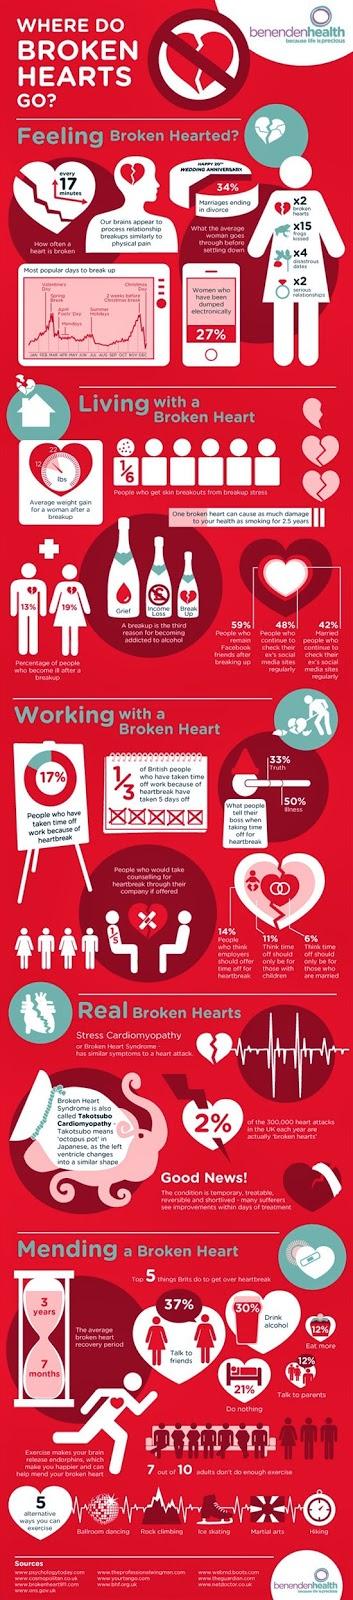 https://www.benenden.co.uk/healthy-heart/